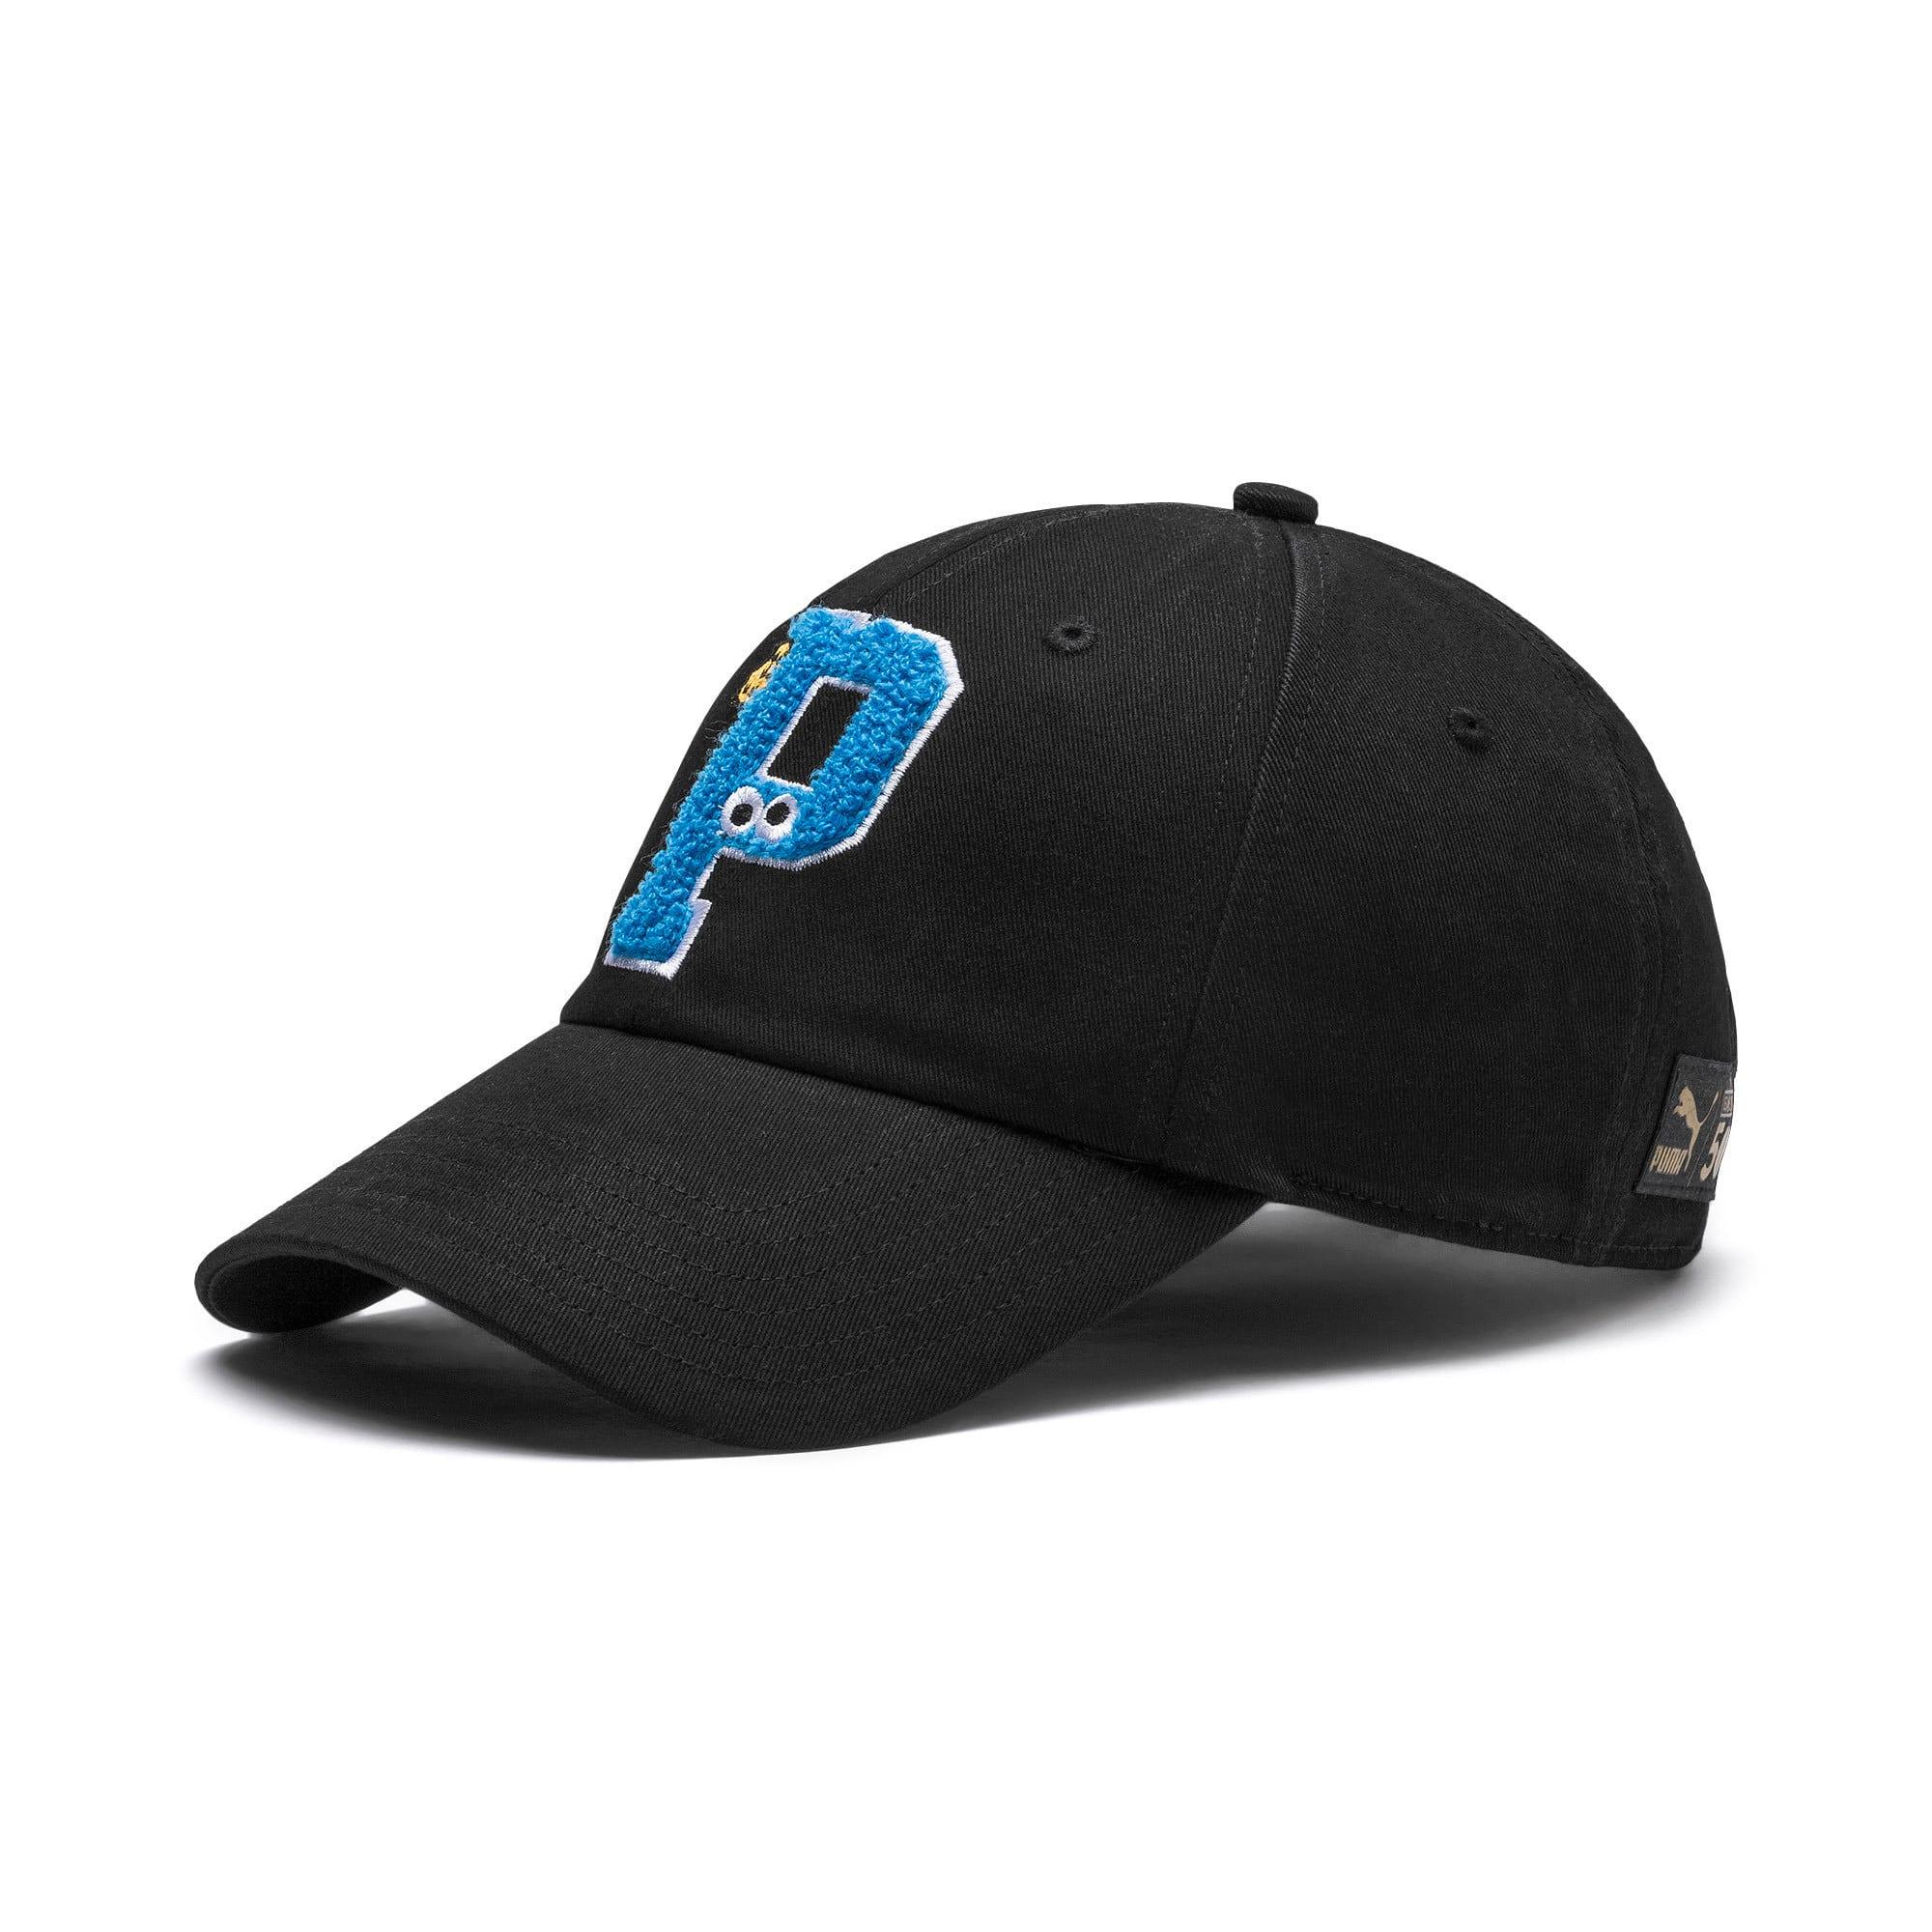 Thumbnail 1 of Sesame Street Kids' Baseball Cap, Puma Black, medium-IND